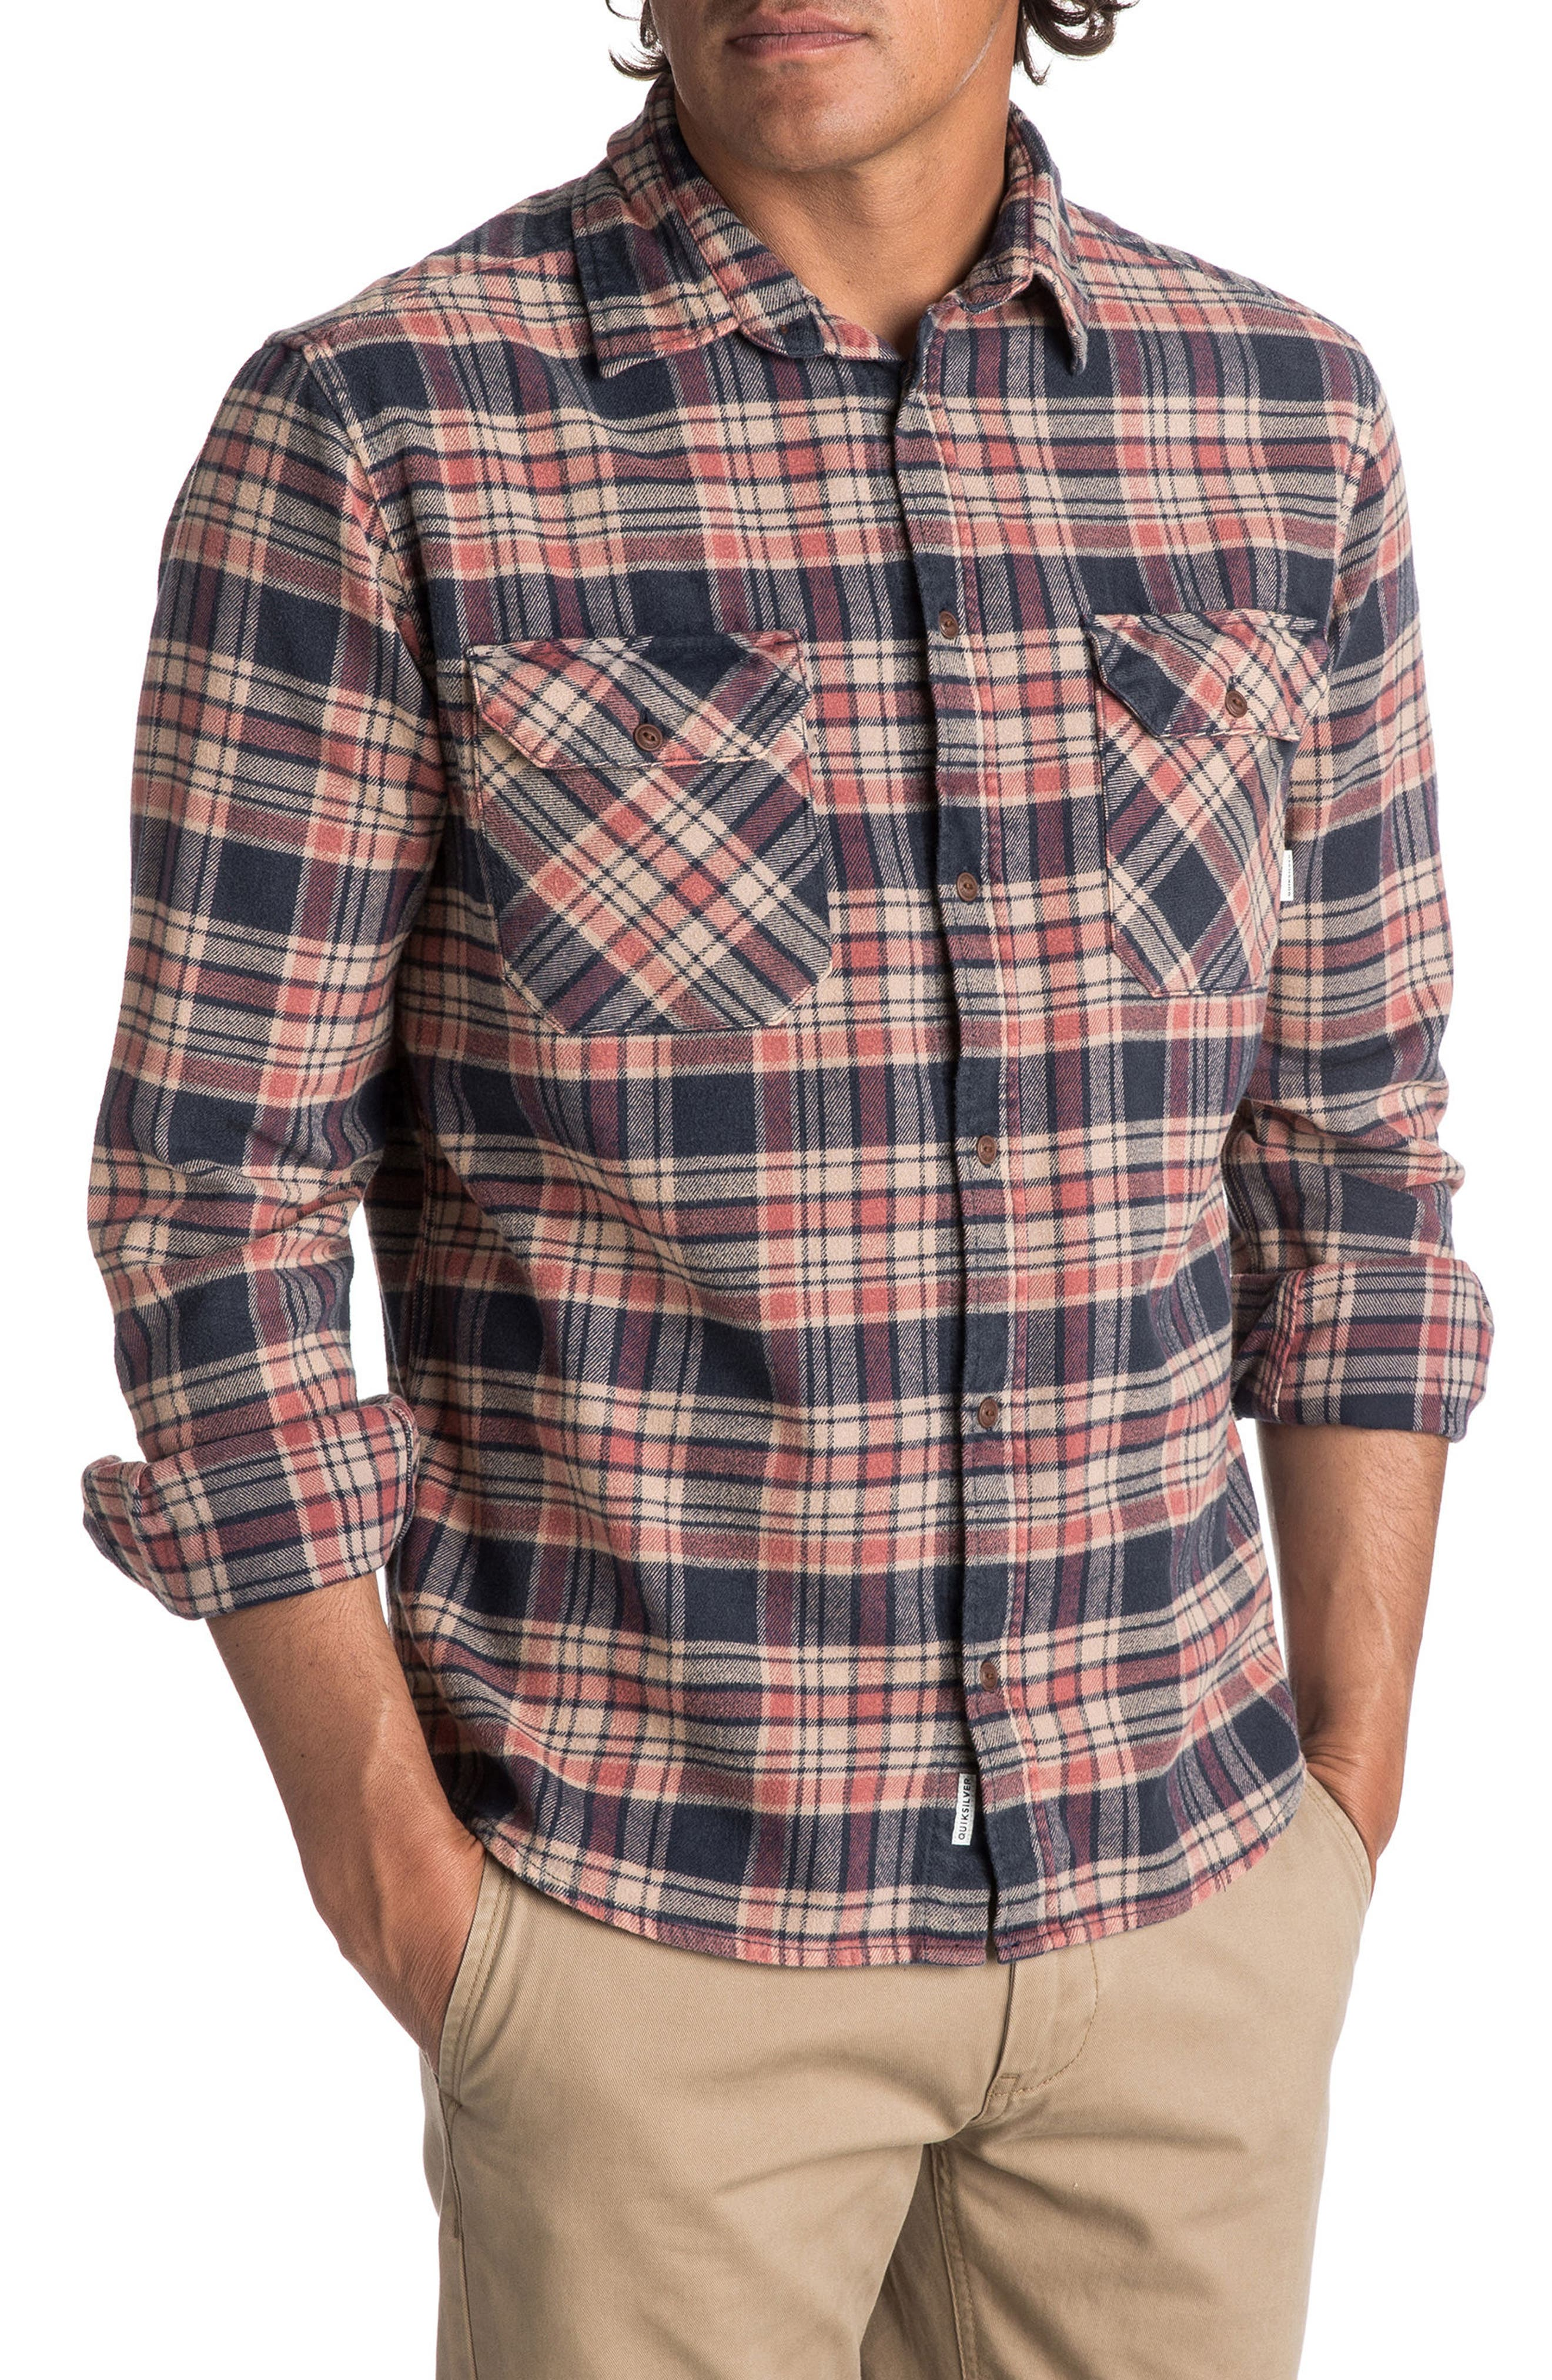 Tangloop Plaid Flannel Shirt,                             Main thumbnail 1, color,                             005